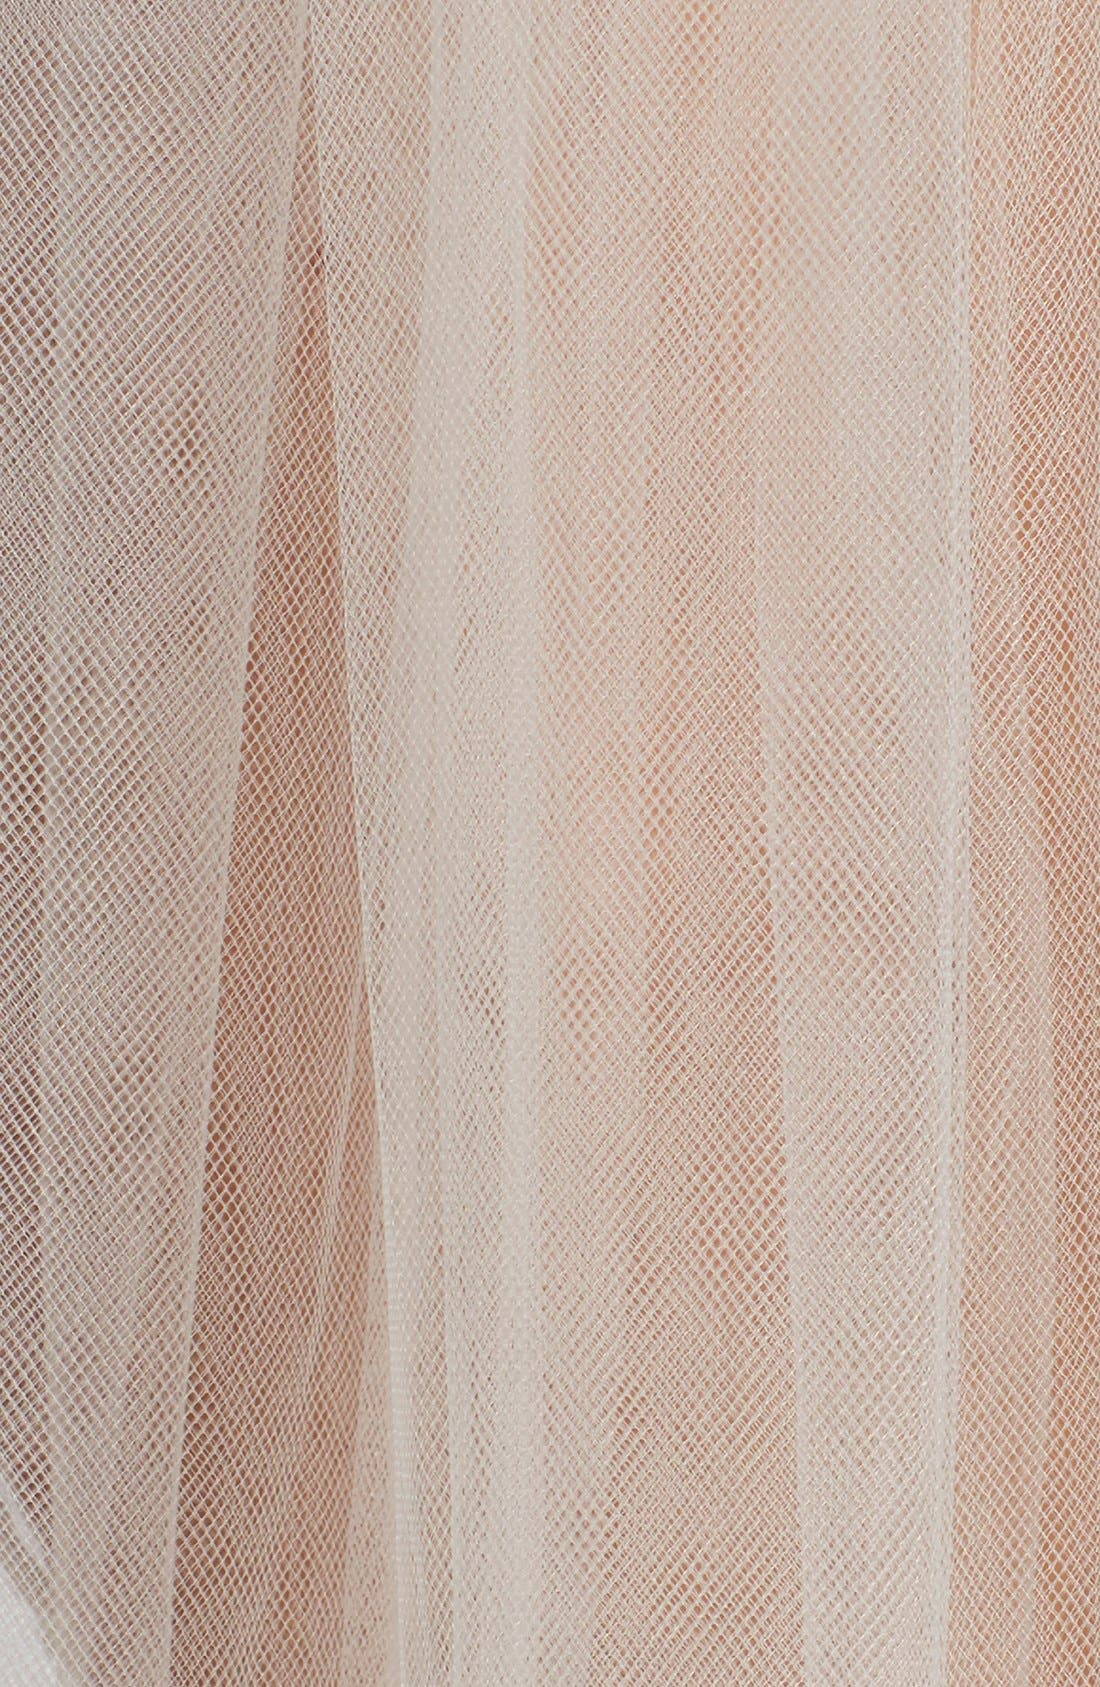 'Christina' Tulle Veil,                             Alternate thumbnail 4, color,                             WHITE